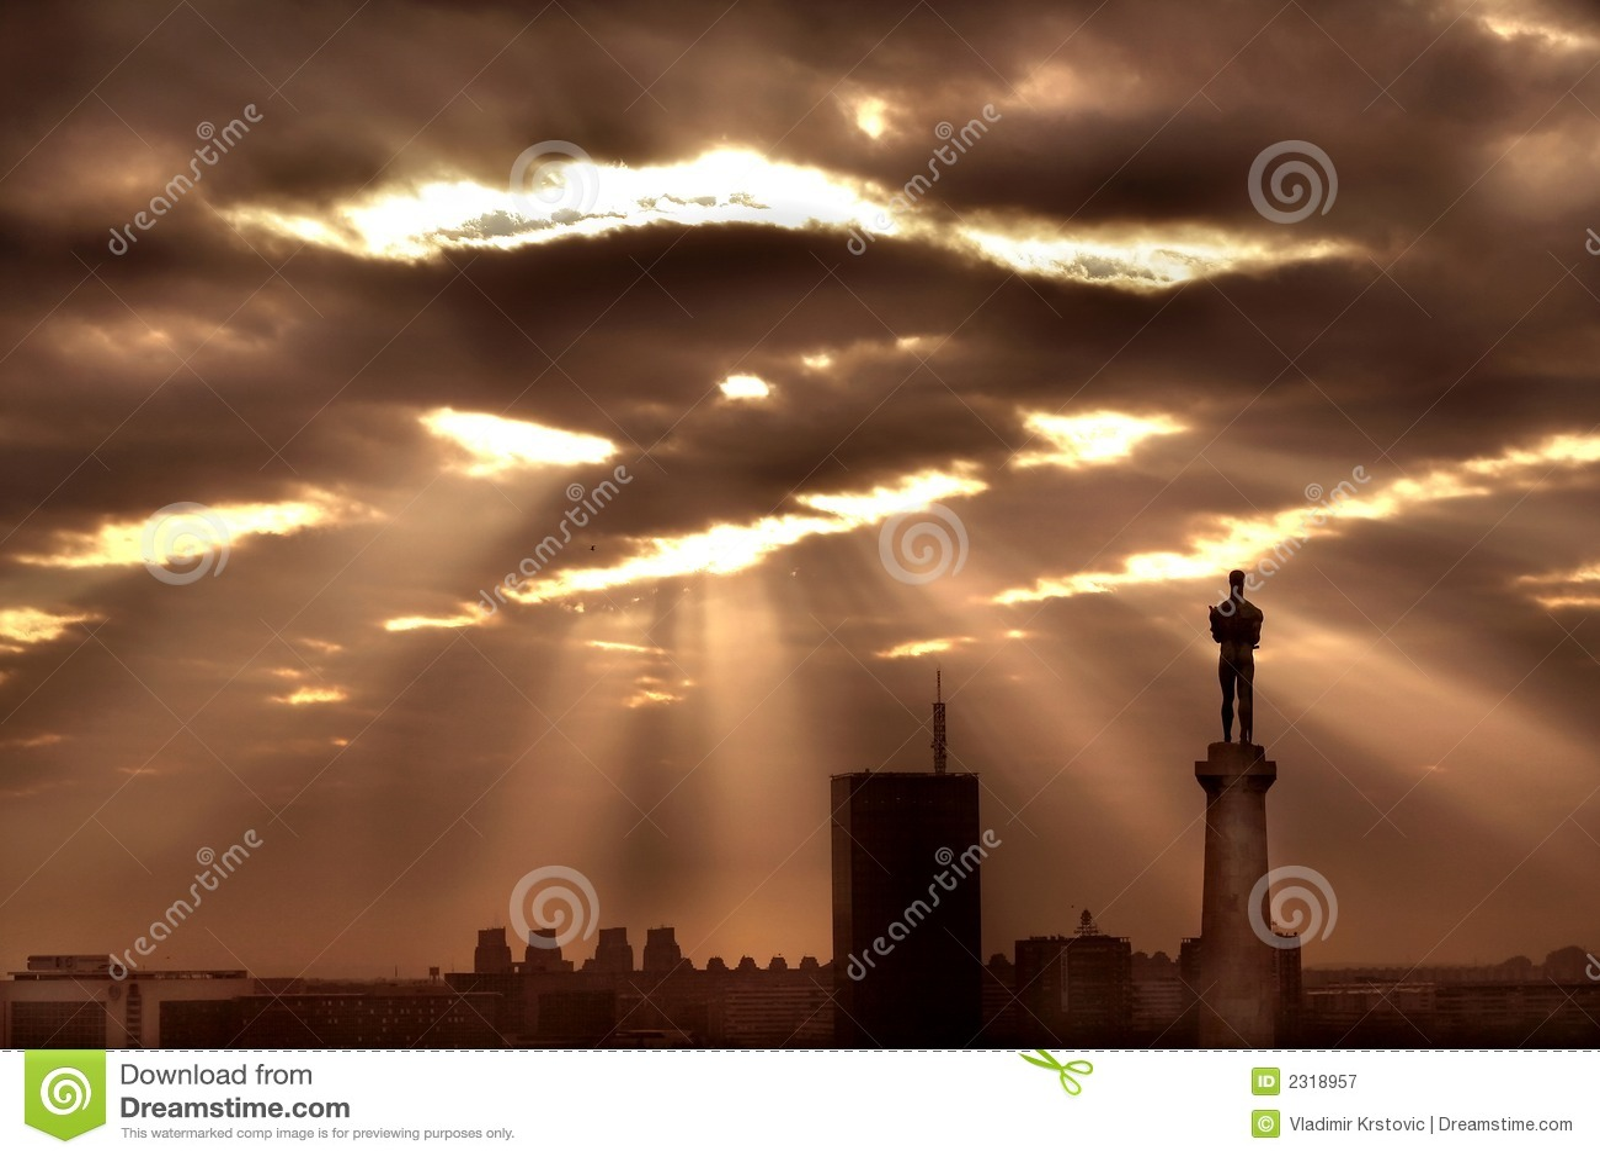 Clouds sun